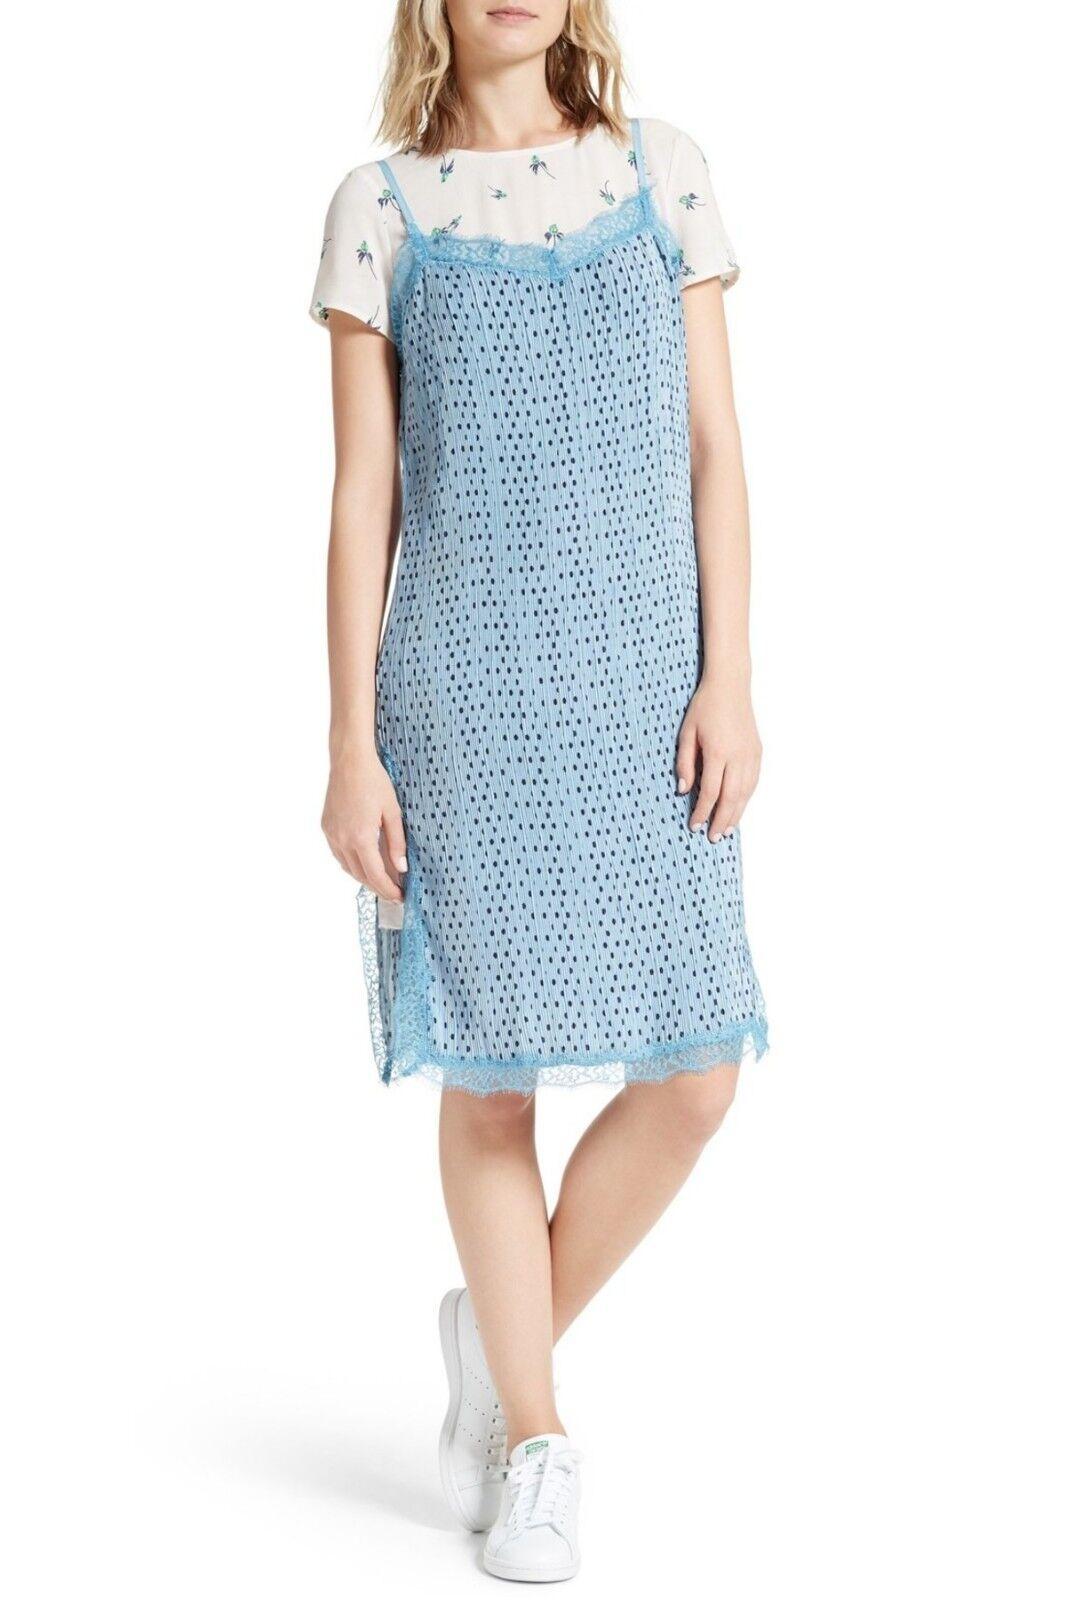 Free People Margot Slip Dress & Tee 2-Piece Set Blau 6 Nwt